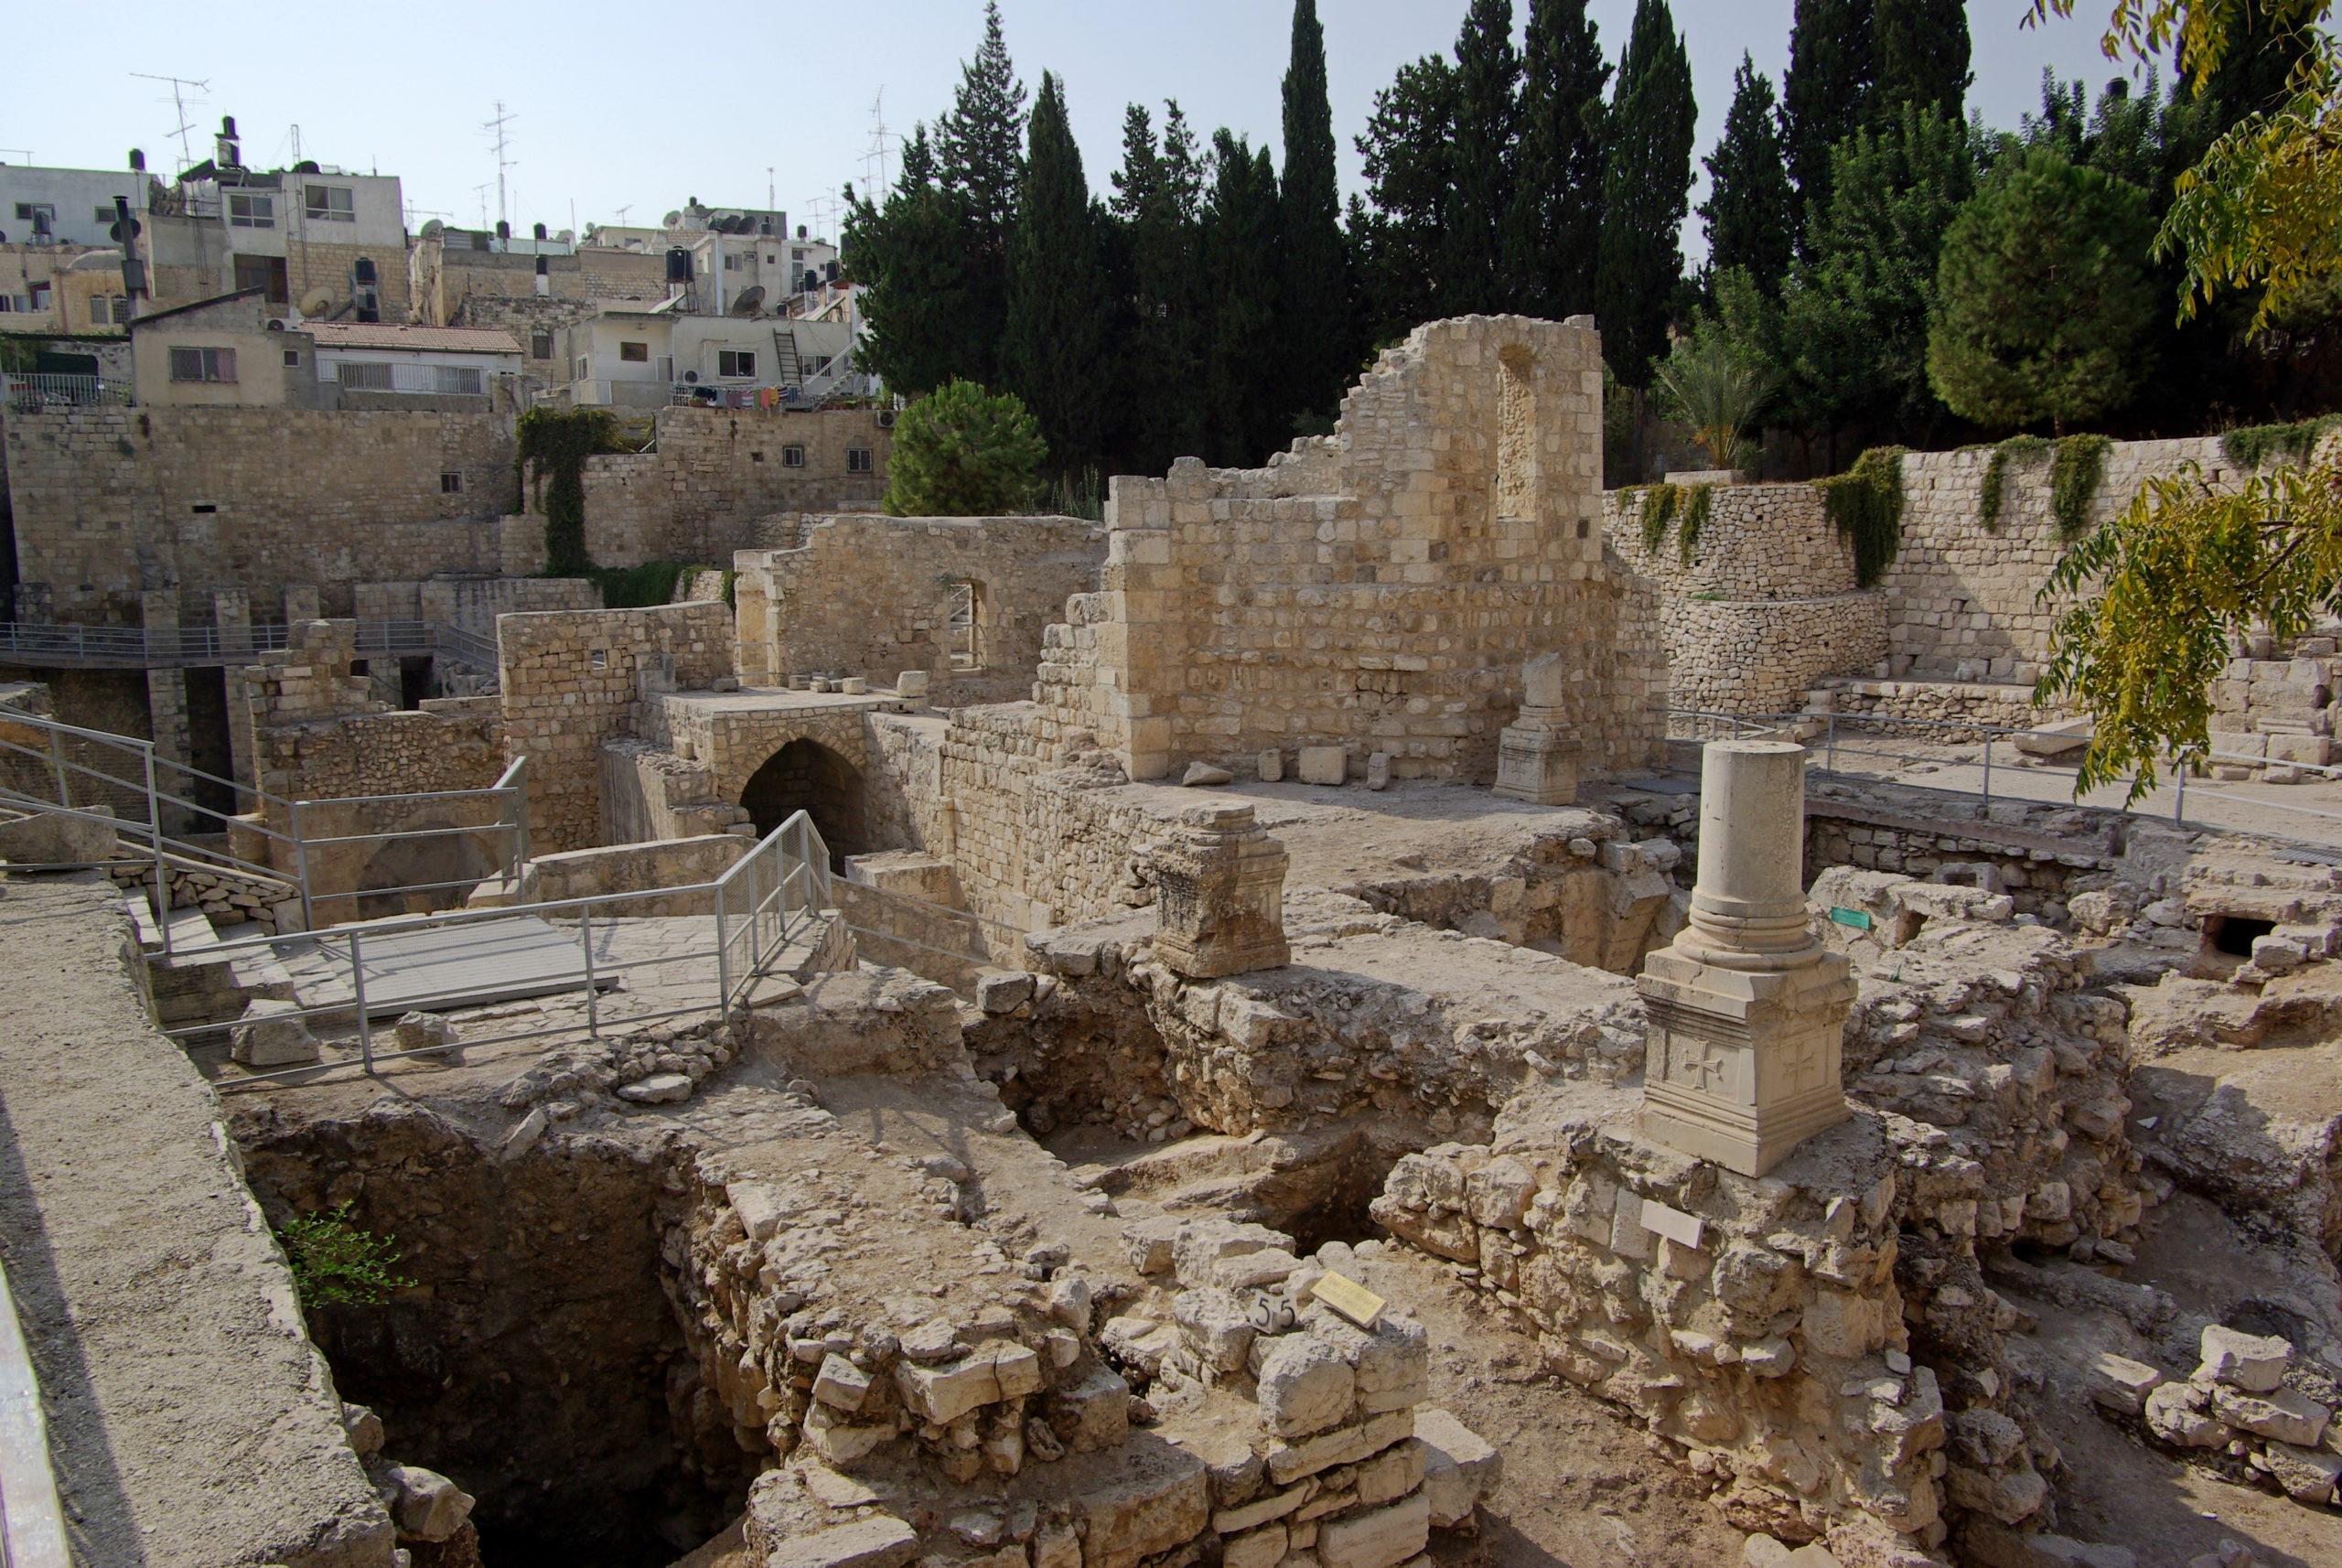 jerusalem_bethesda_bw_6